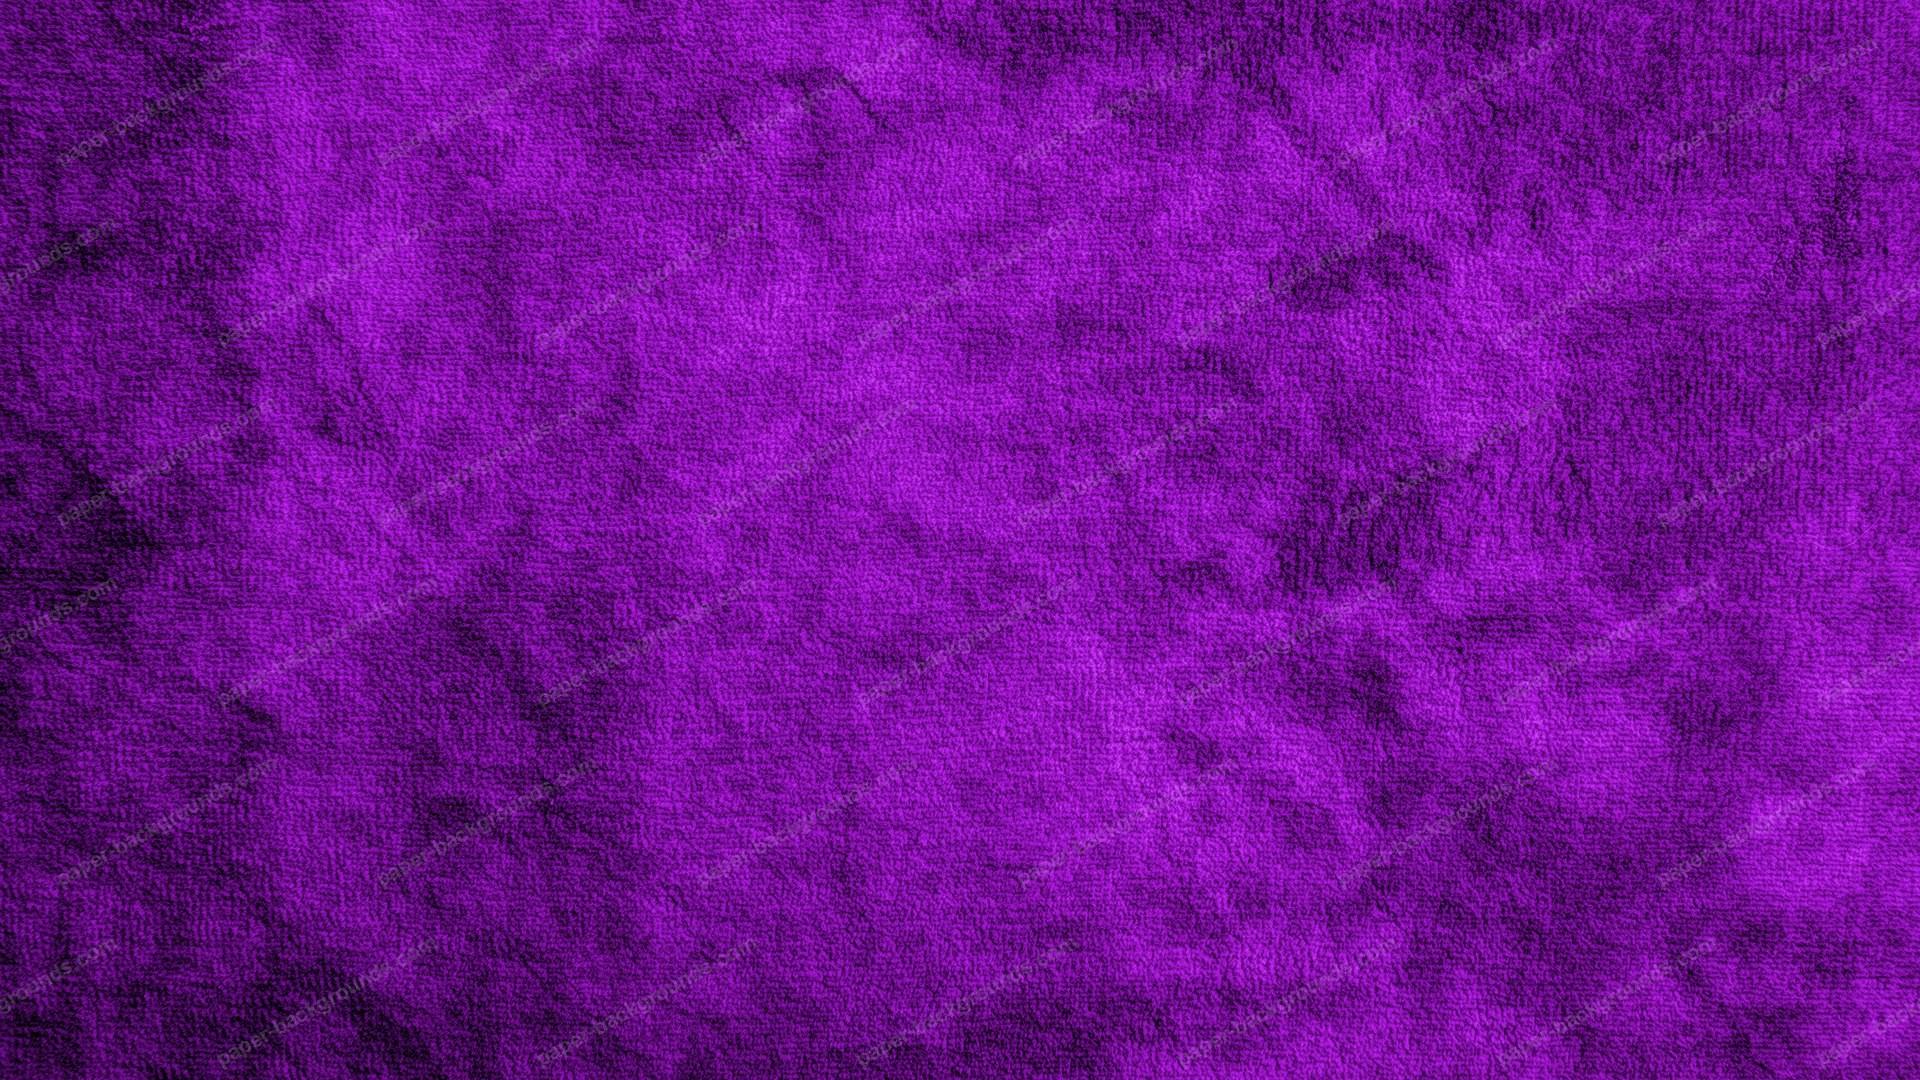 Purple Drank Wallpaper (65+ Images